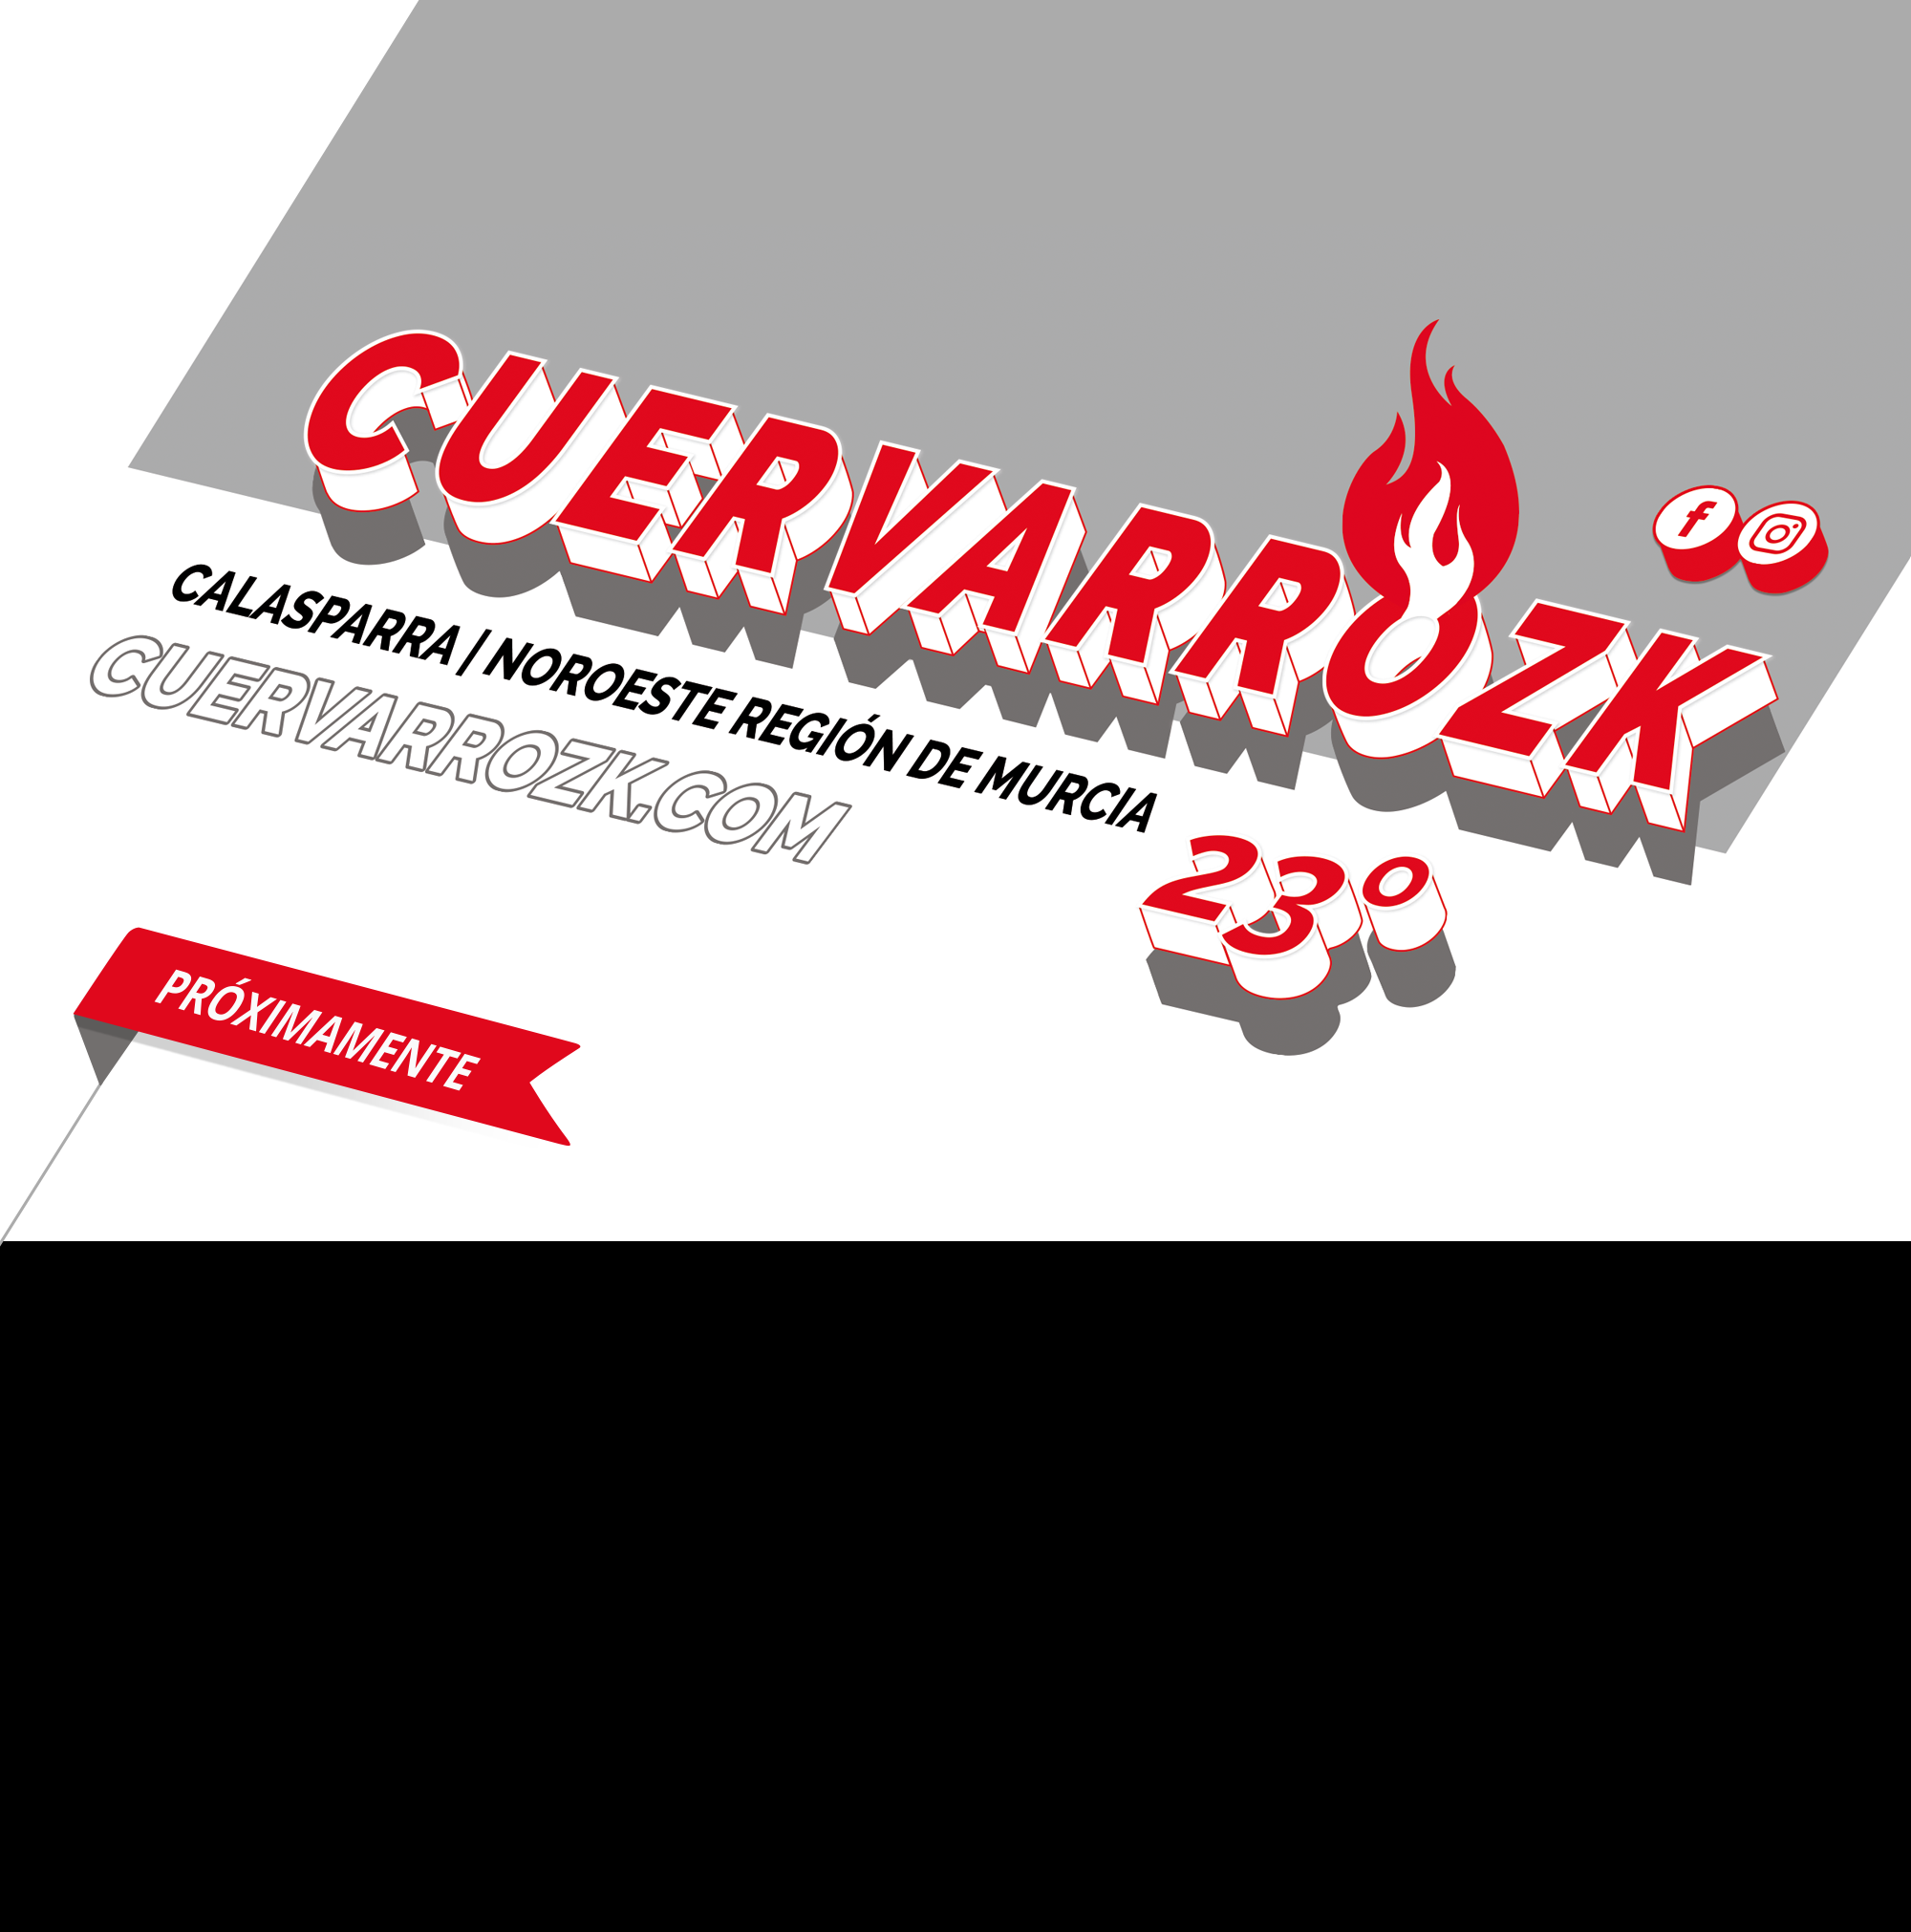 CUERVARROZK 2018 · 22º